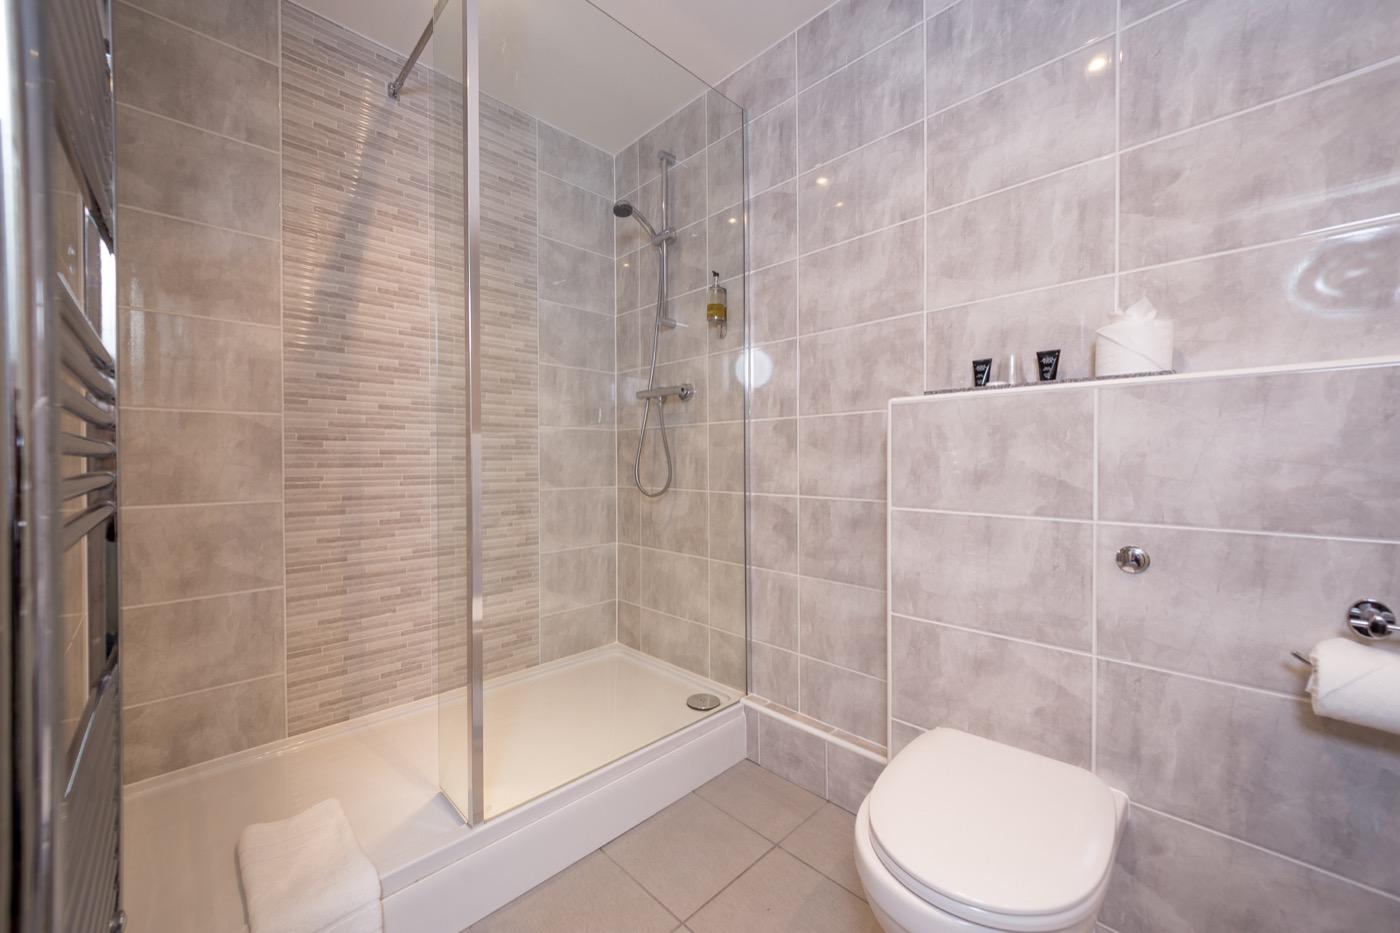 York Hotel Renovations - Bathroom